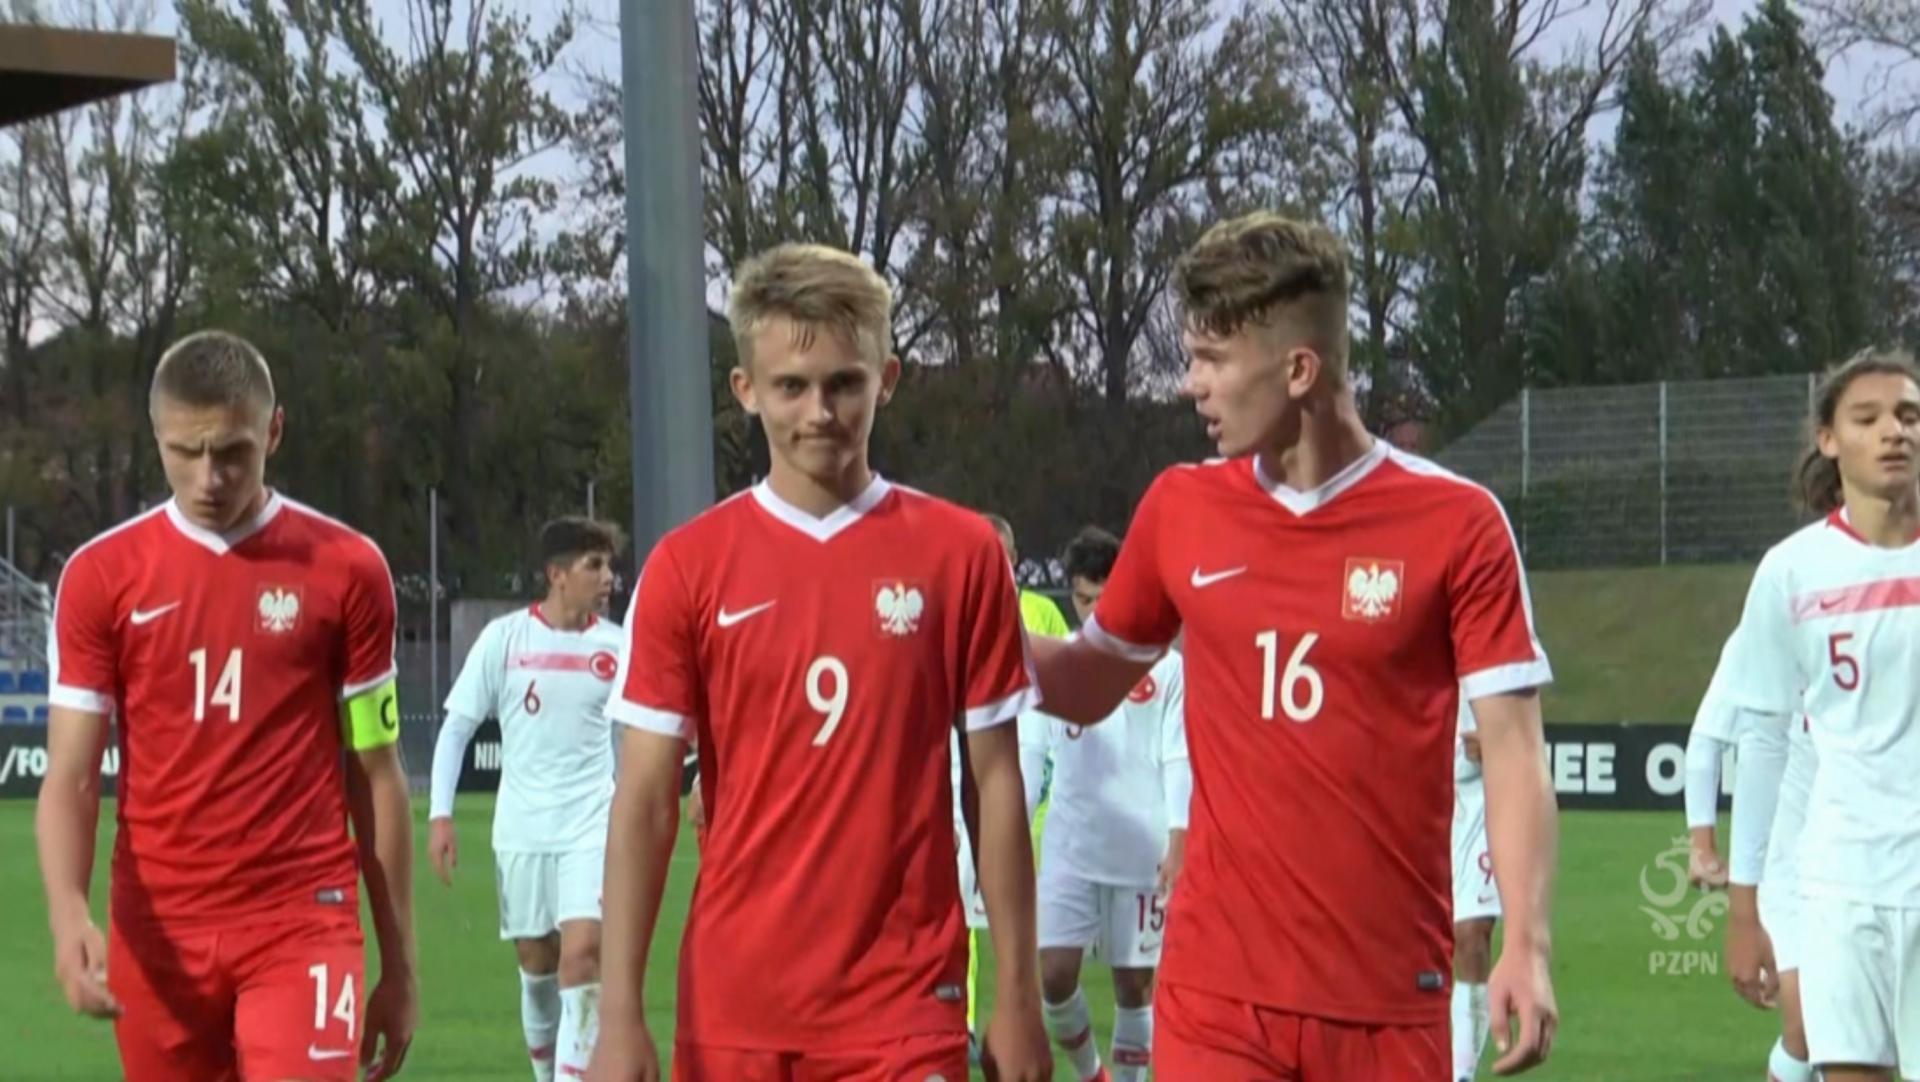 Norbert Pacławski podczas meczu Polska - Turcja 3:2 U-16 (19.09.2019).